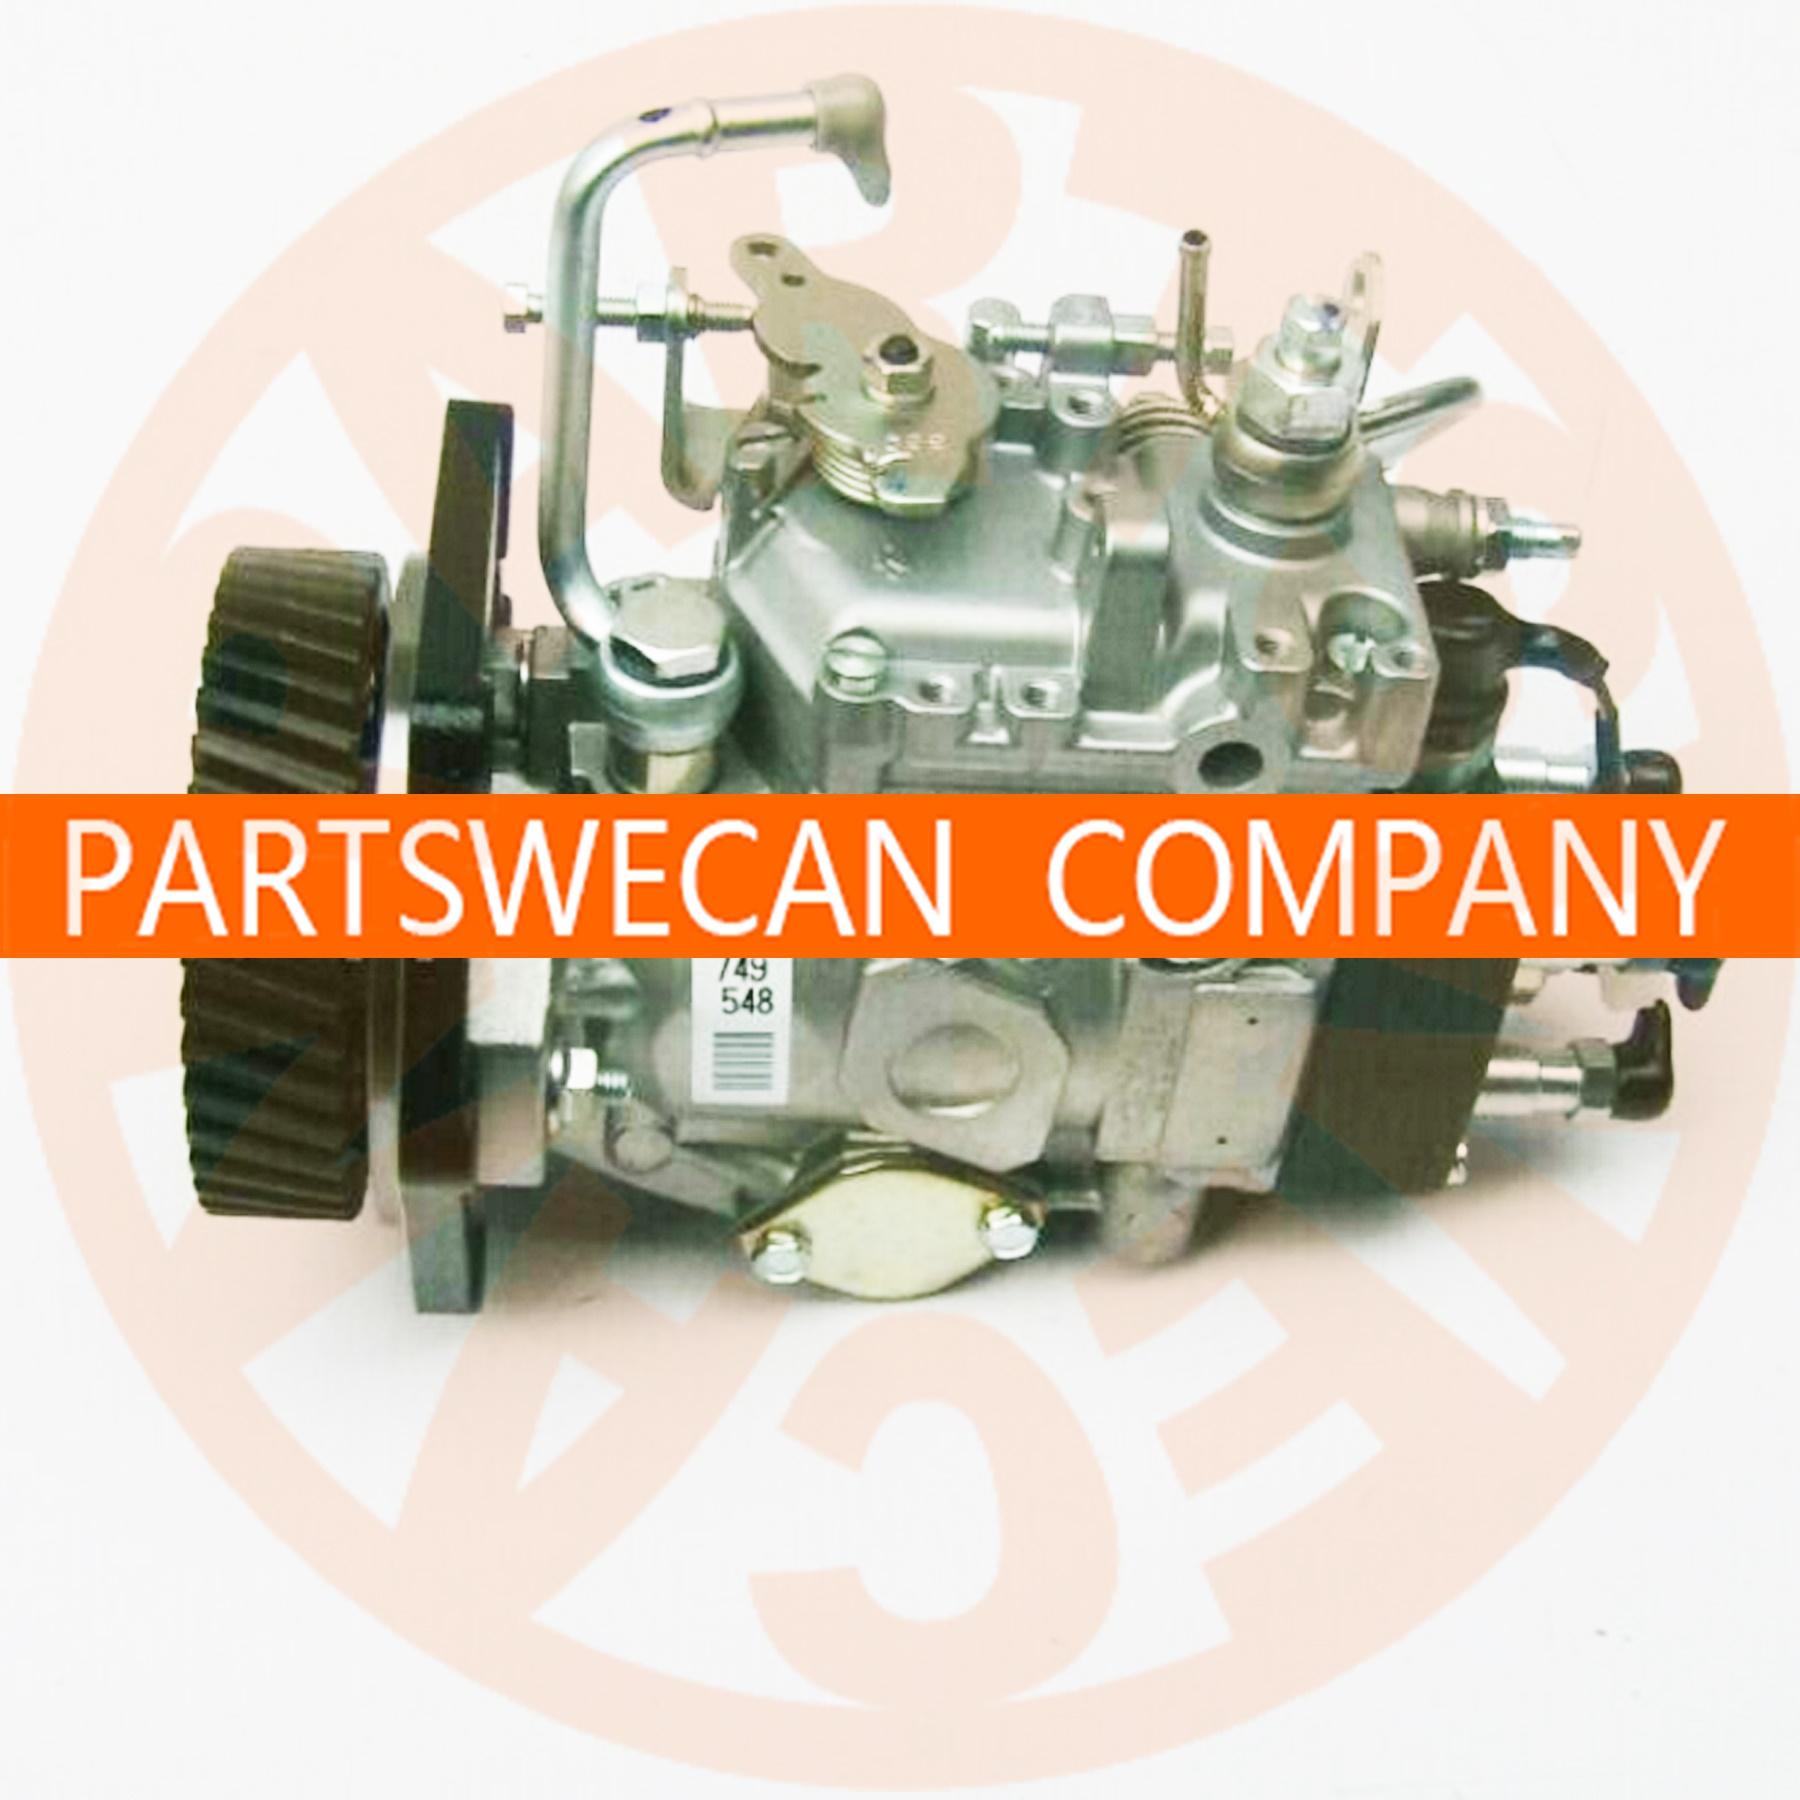 Download isuzu c240 parts manual